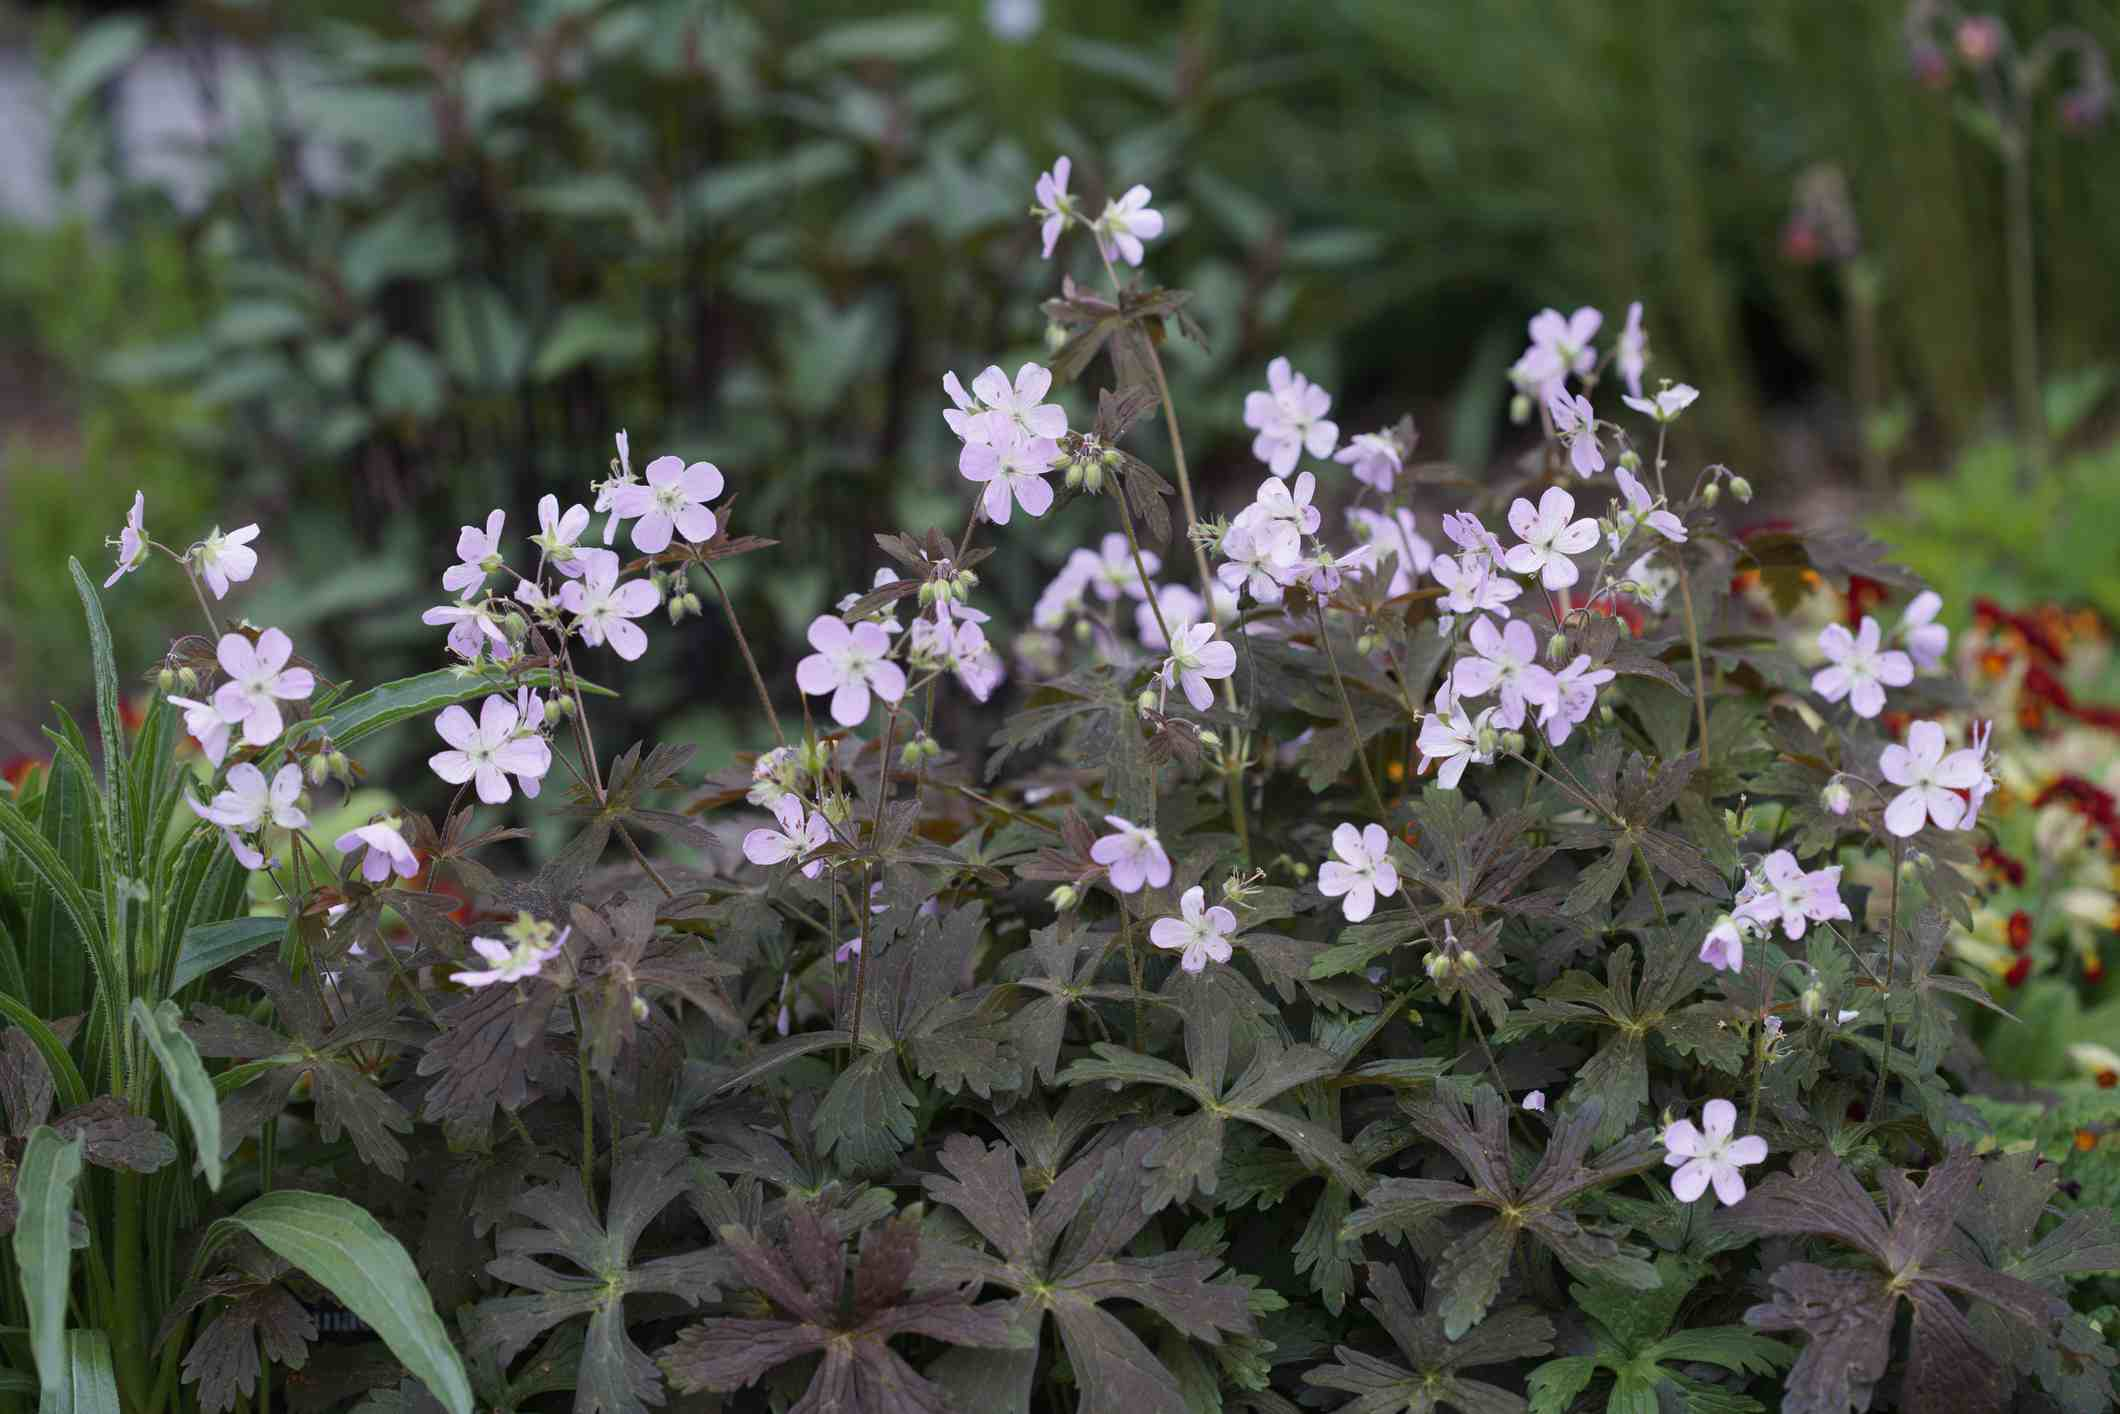 'Espresso' geranium with lavender flowers